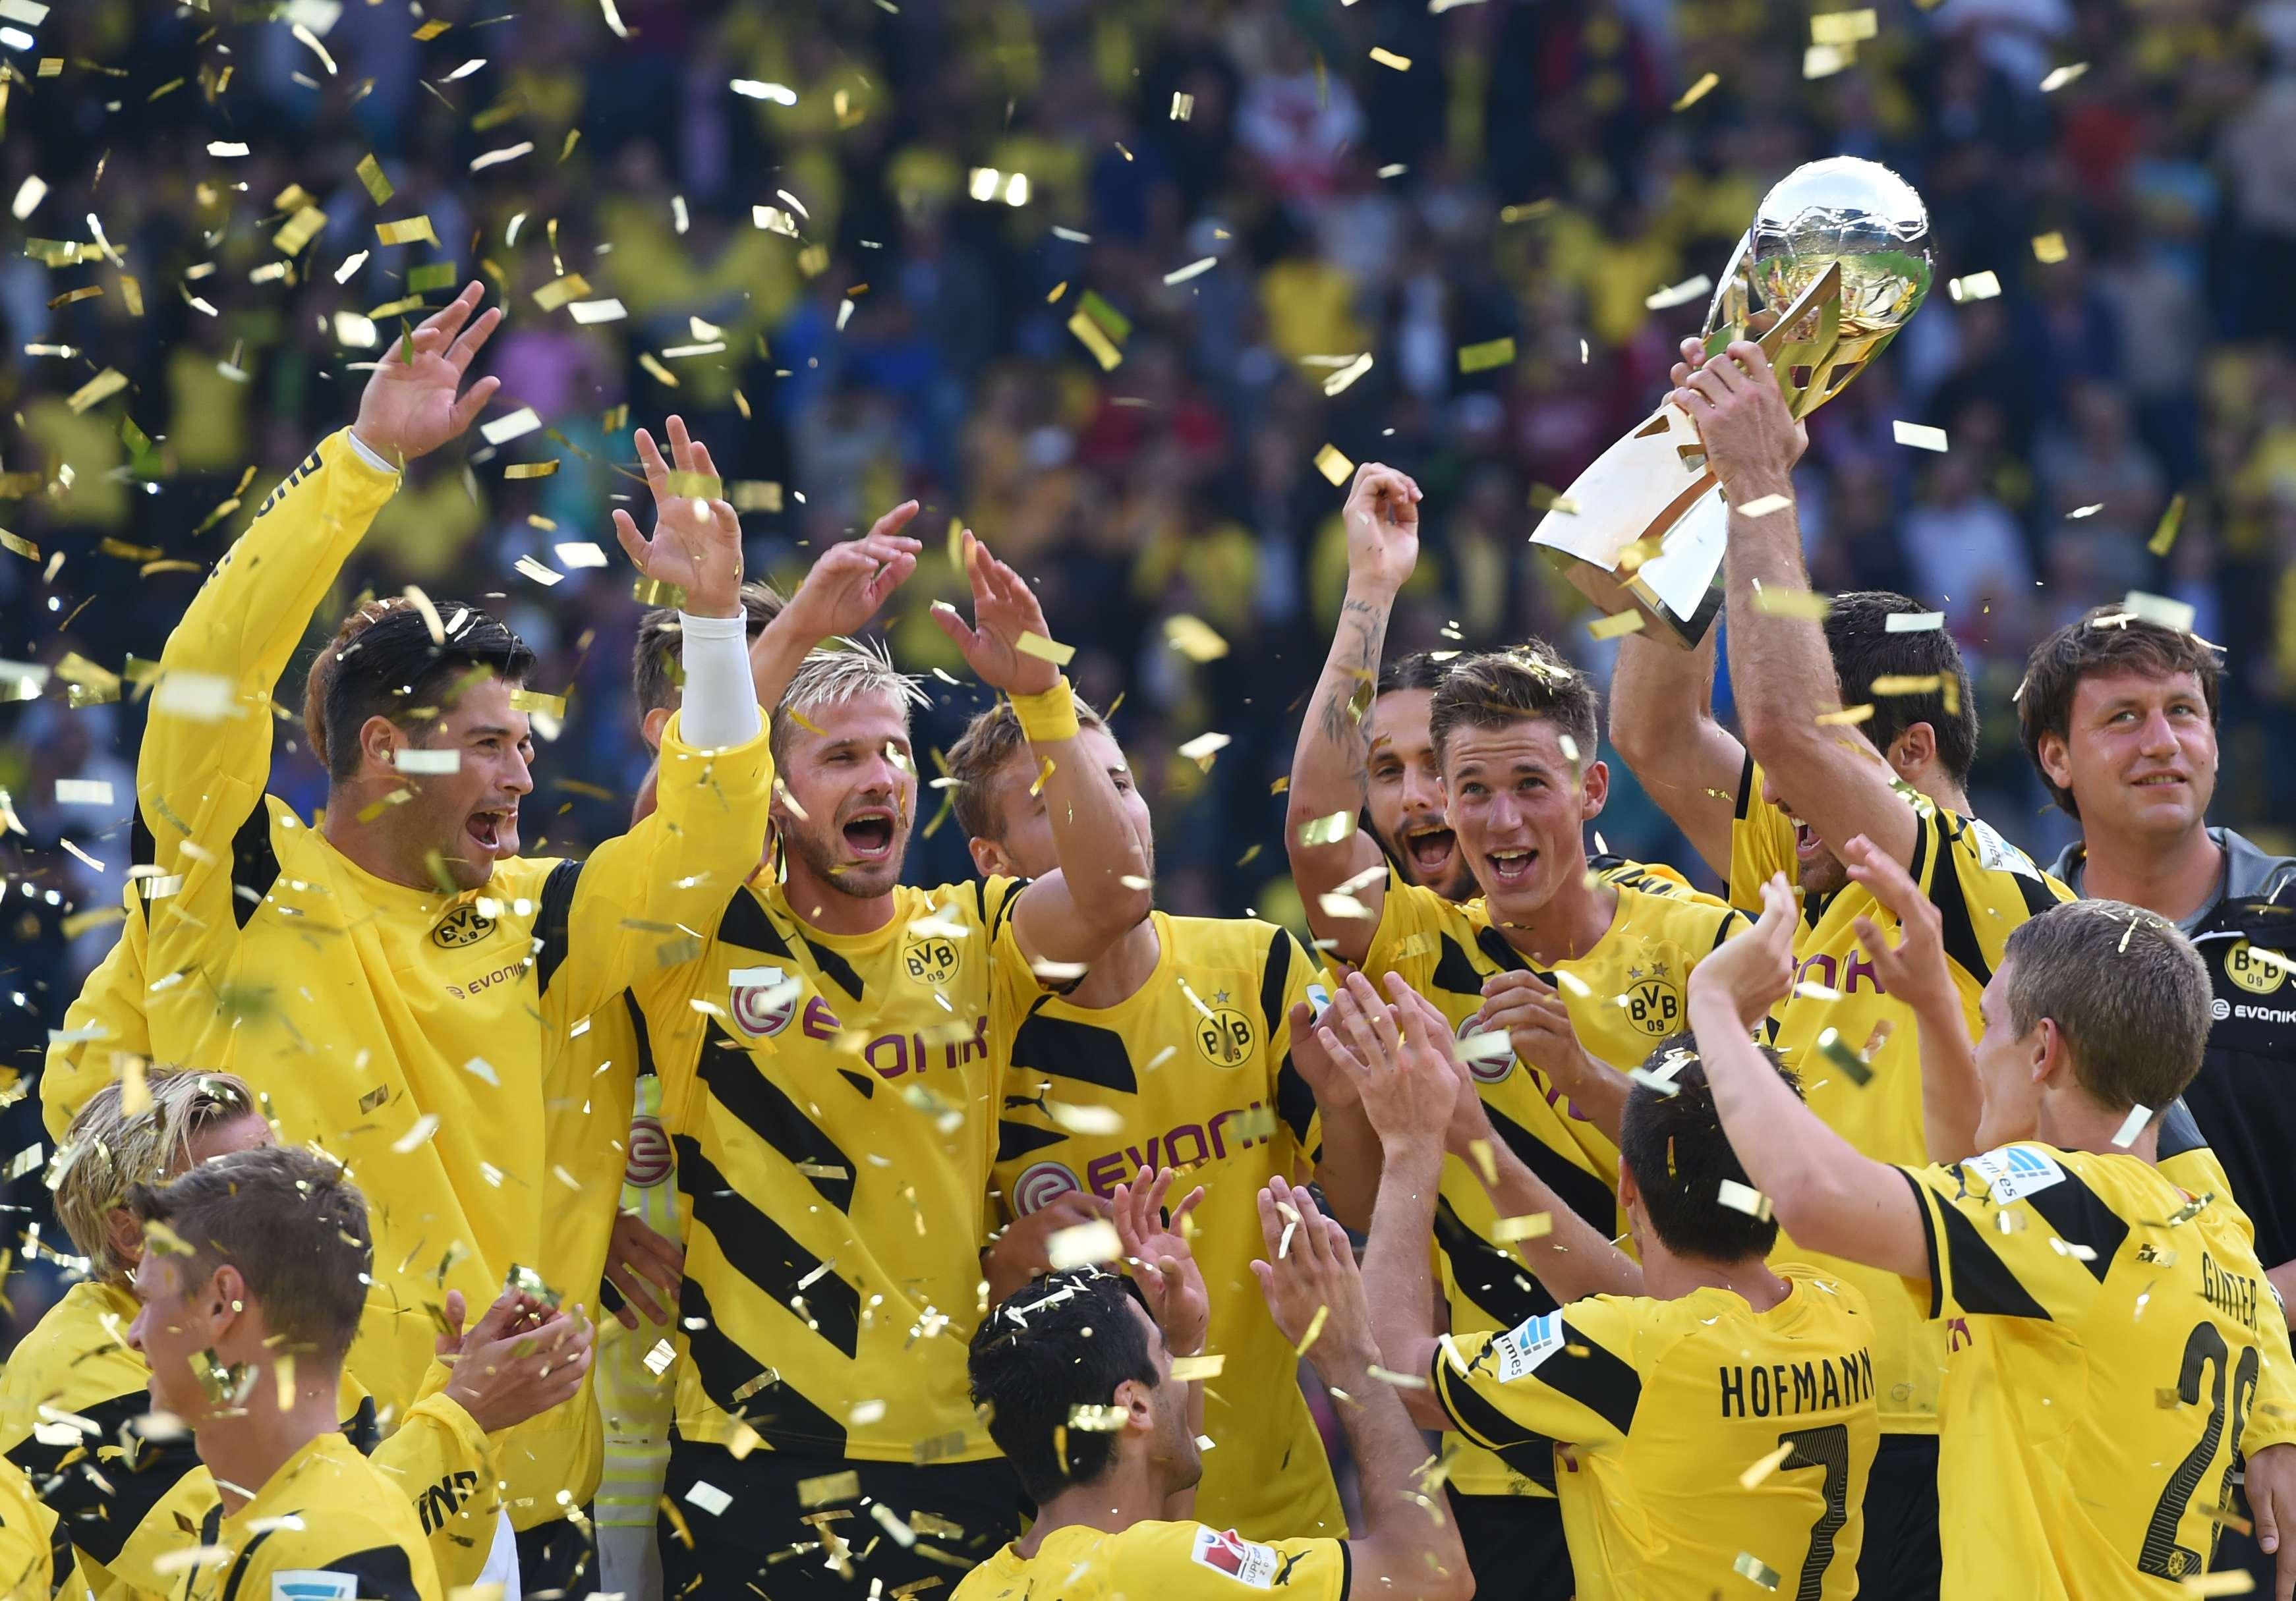 Dortmund doblega al Bayern y se lleva la Supercopa alemana